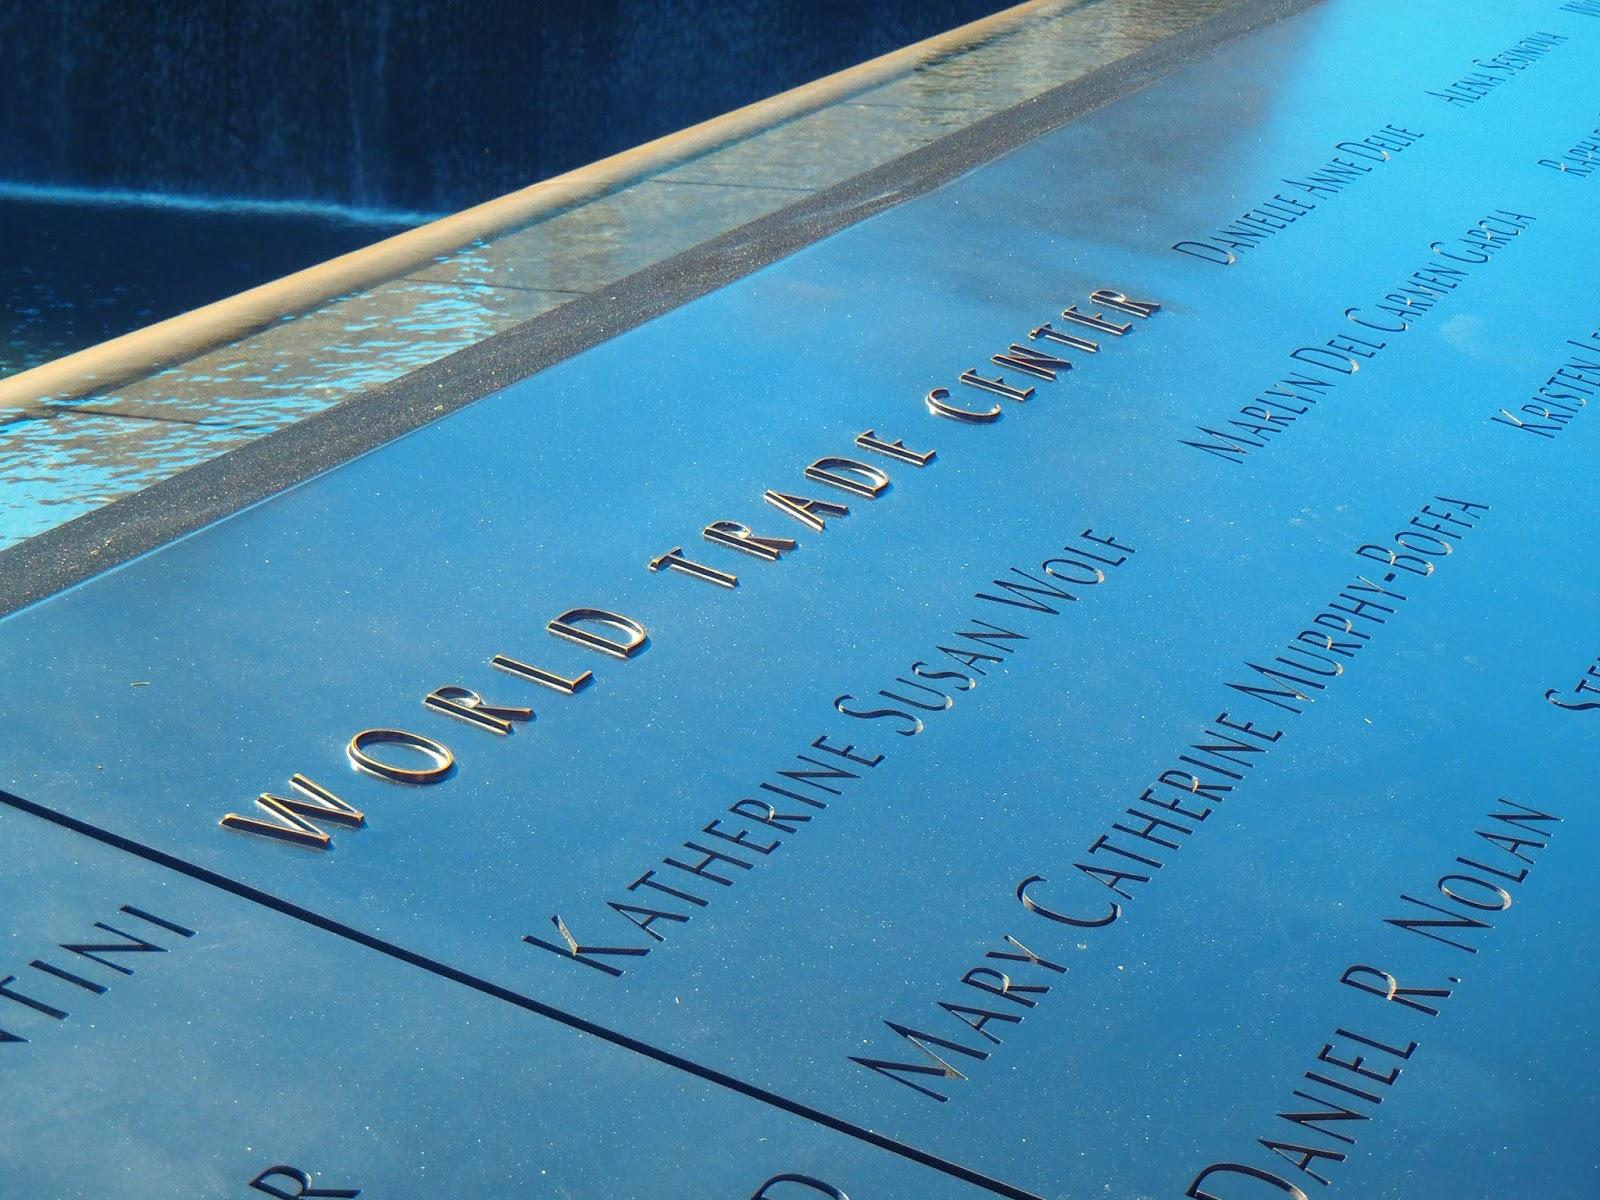 Names inscribed in 9/11 Memorial New York City